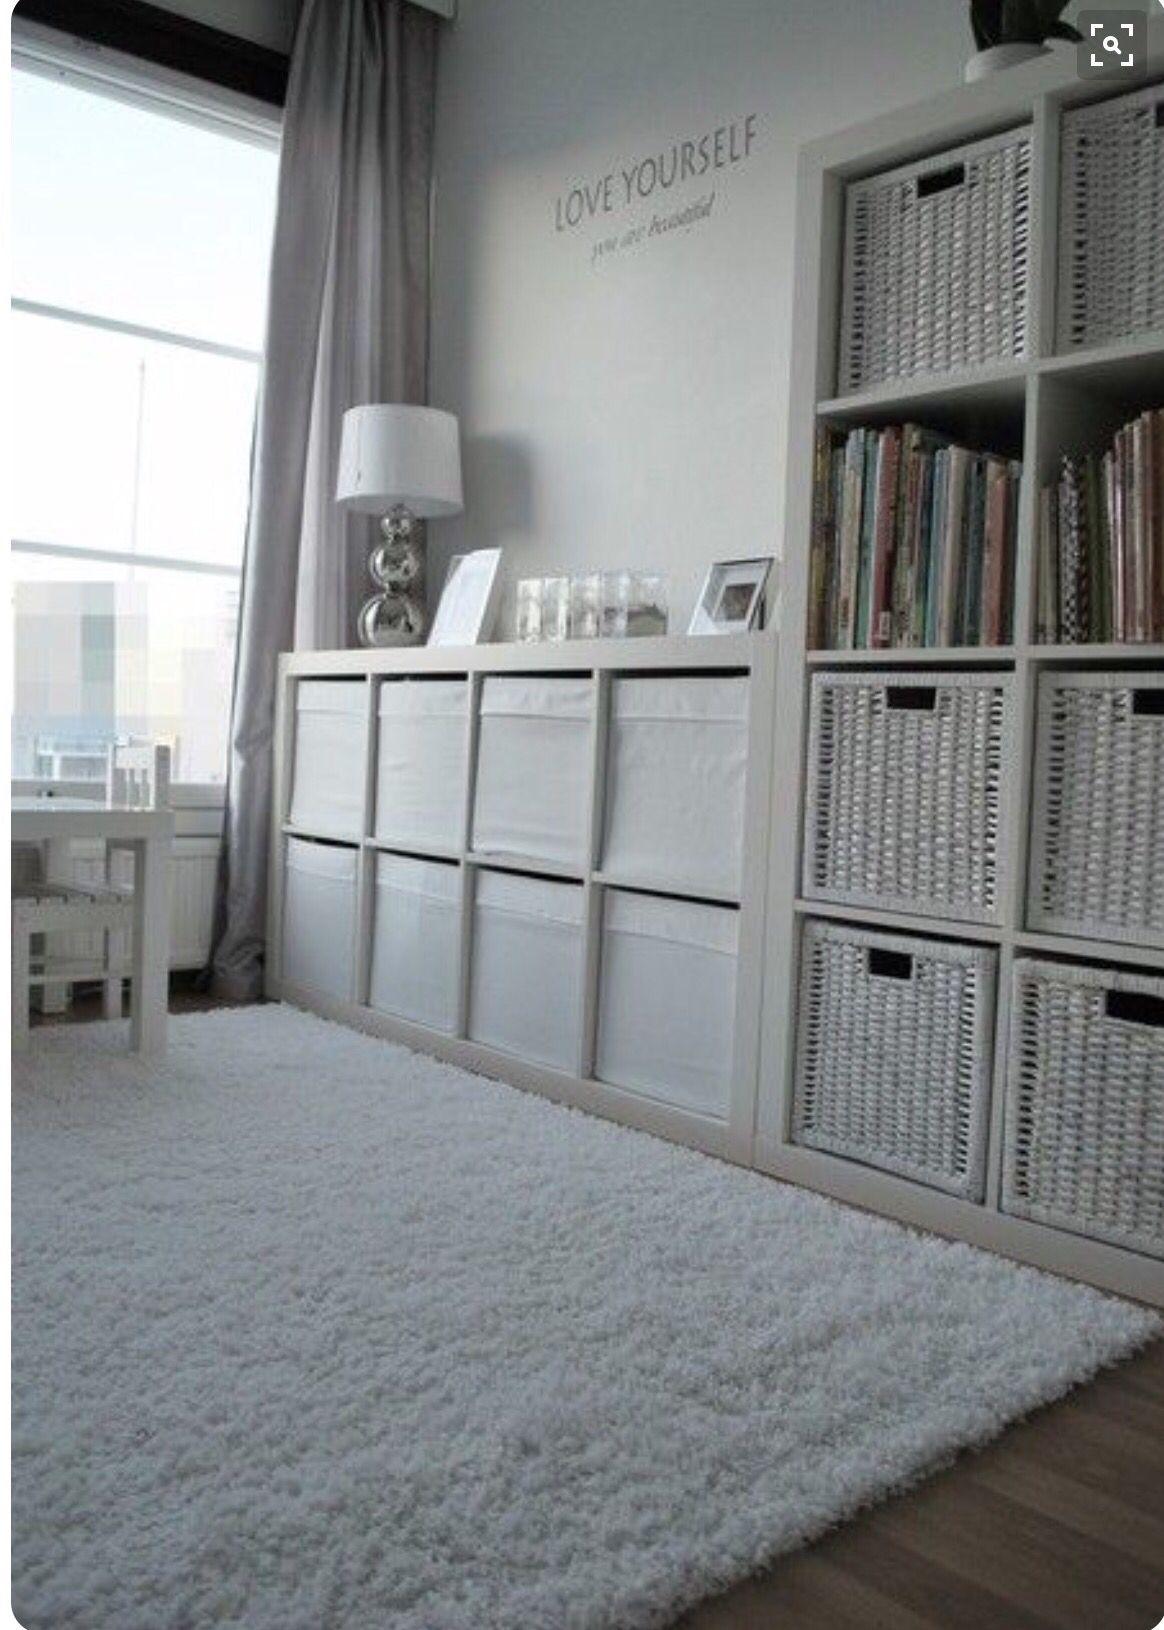 glamorous neeny wishlist ikea bedroom inspiration | My office wish list in 2019 | Ikea kallax shelf, Simple ...